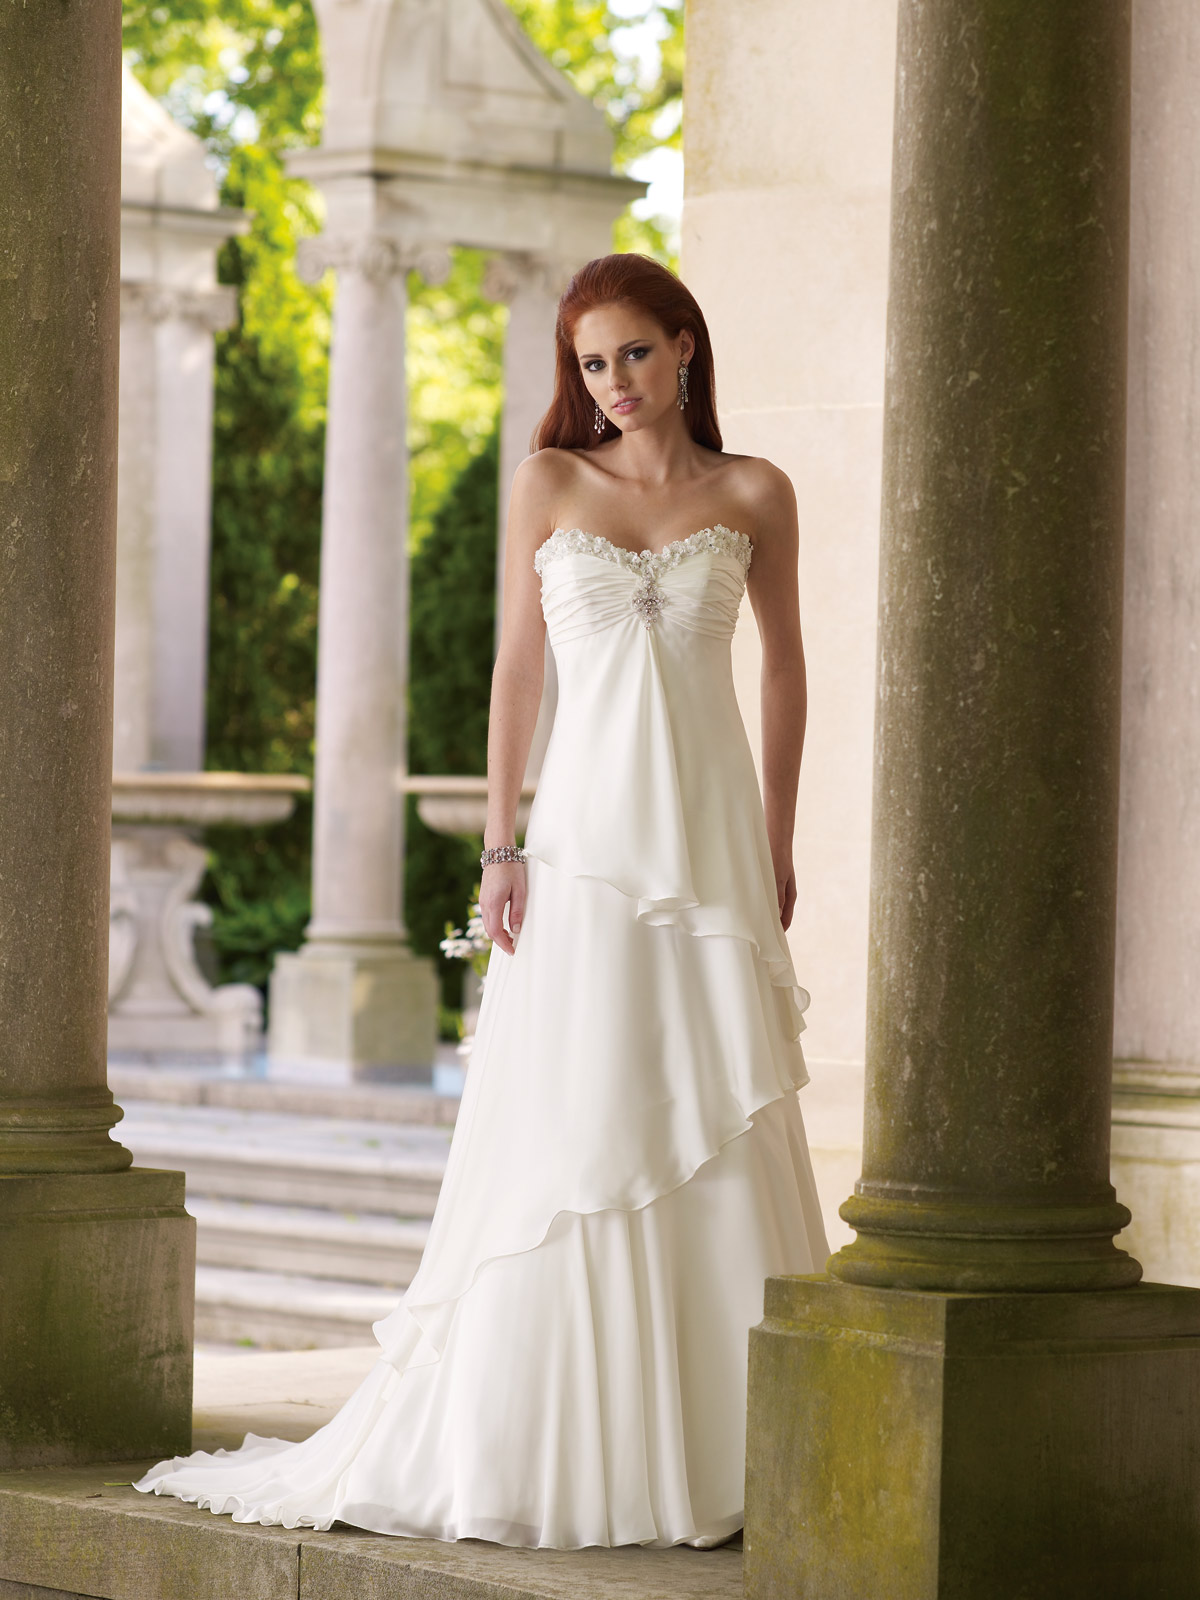 Gallery of Wedding Dress: Naomi Wedding Dress 90210